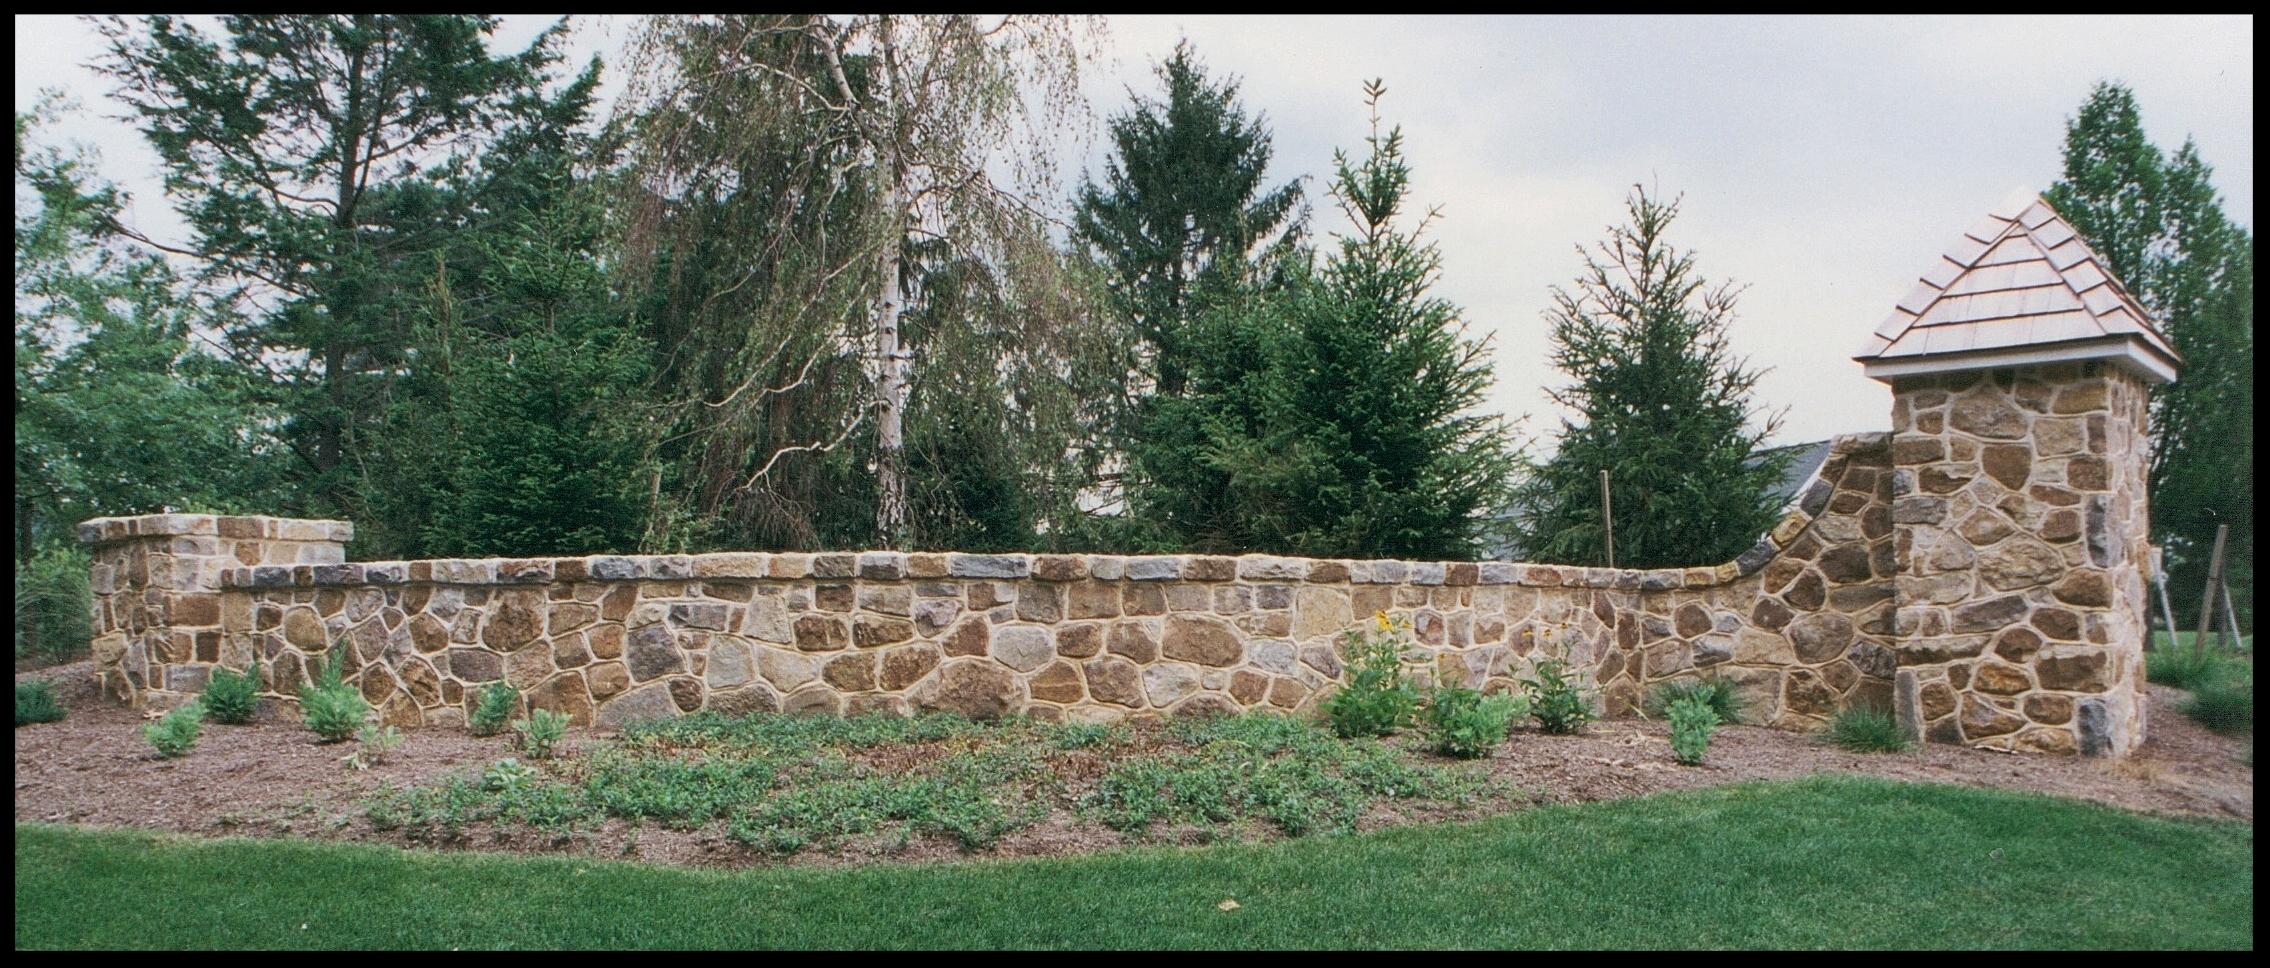 Exterior Garden Wall with Pier.jpg